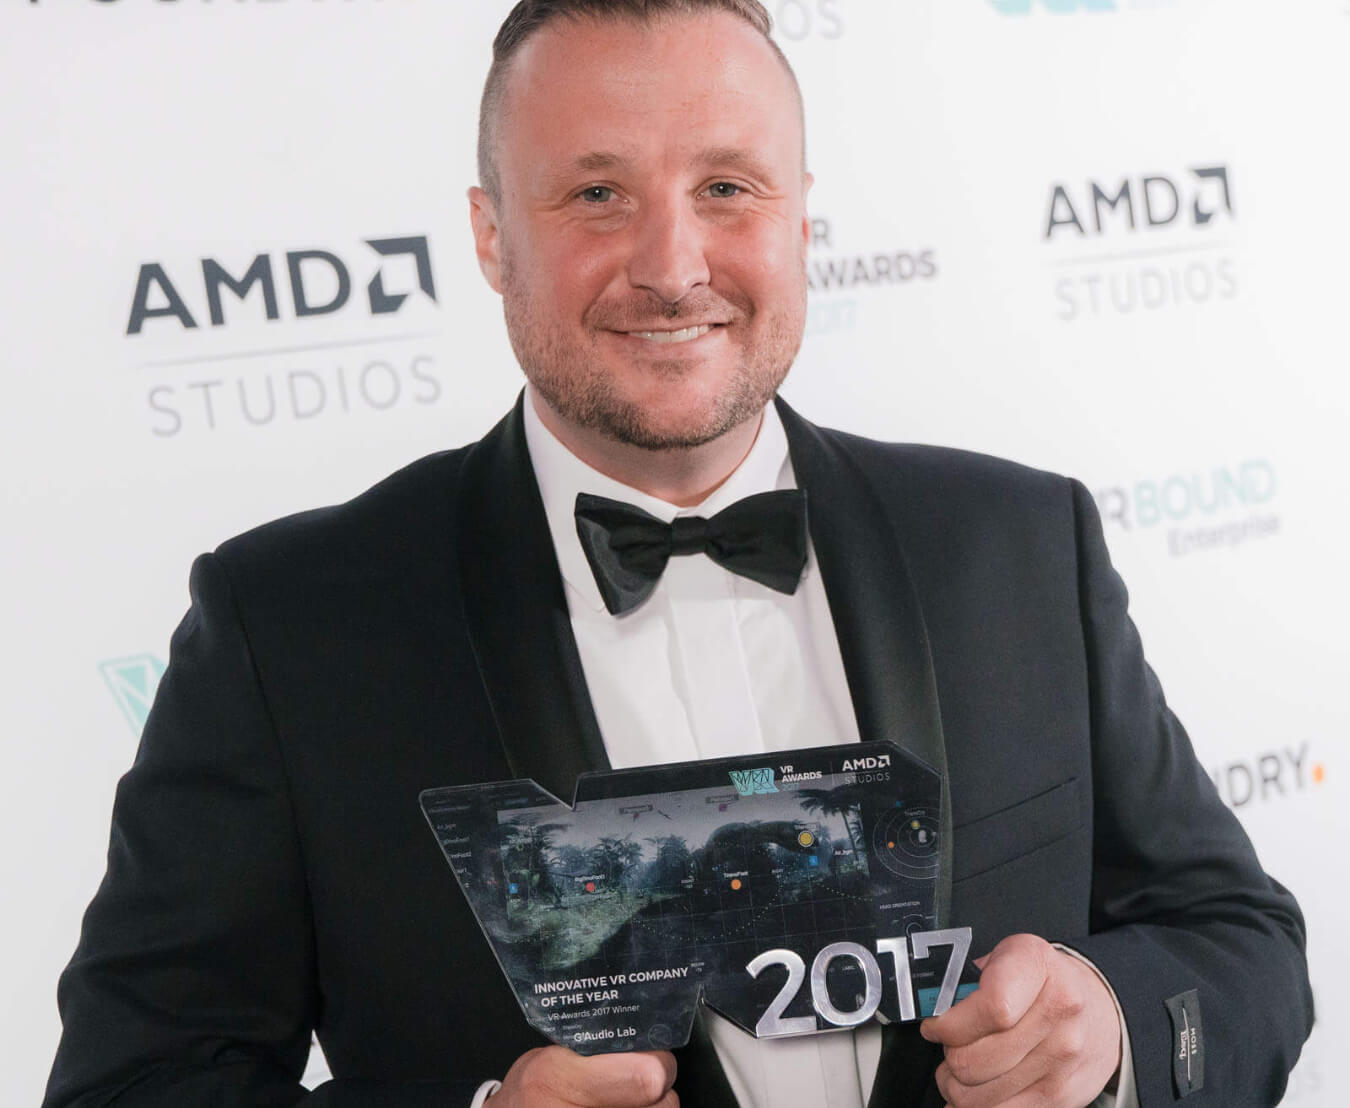 2017 Innovative VR Company of the Year Winner